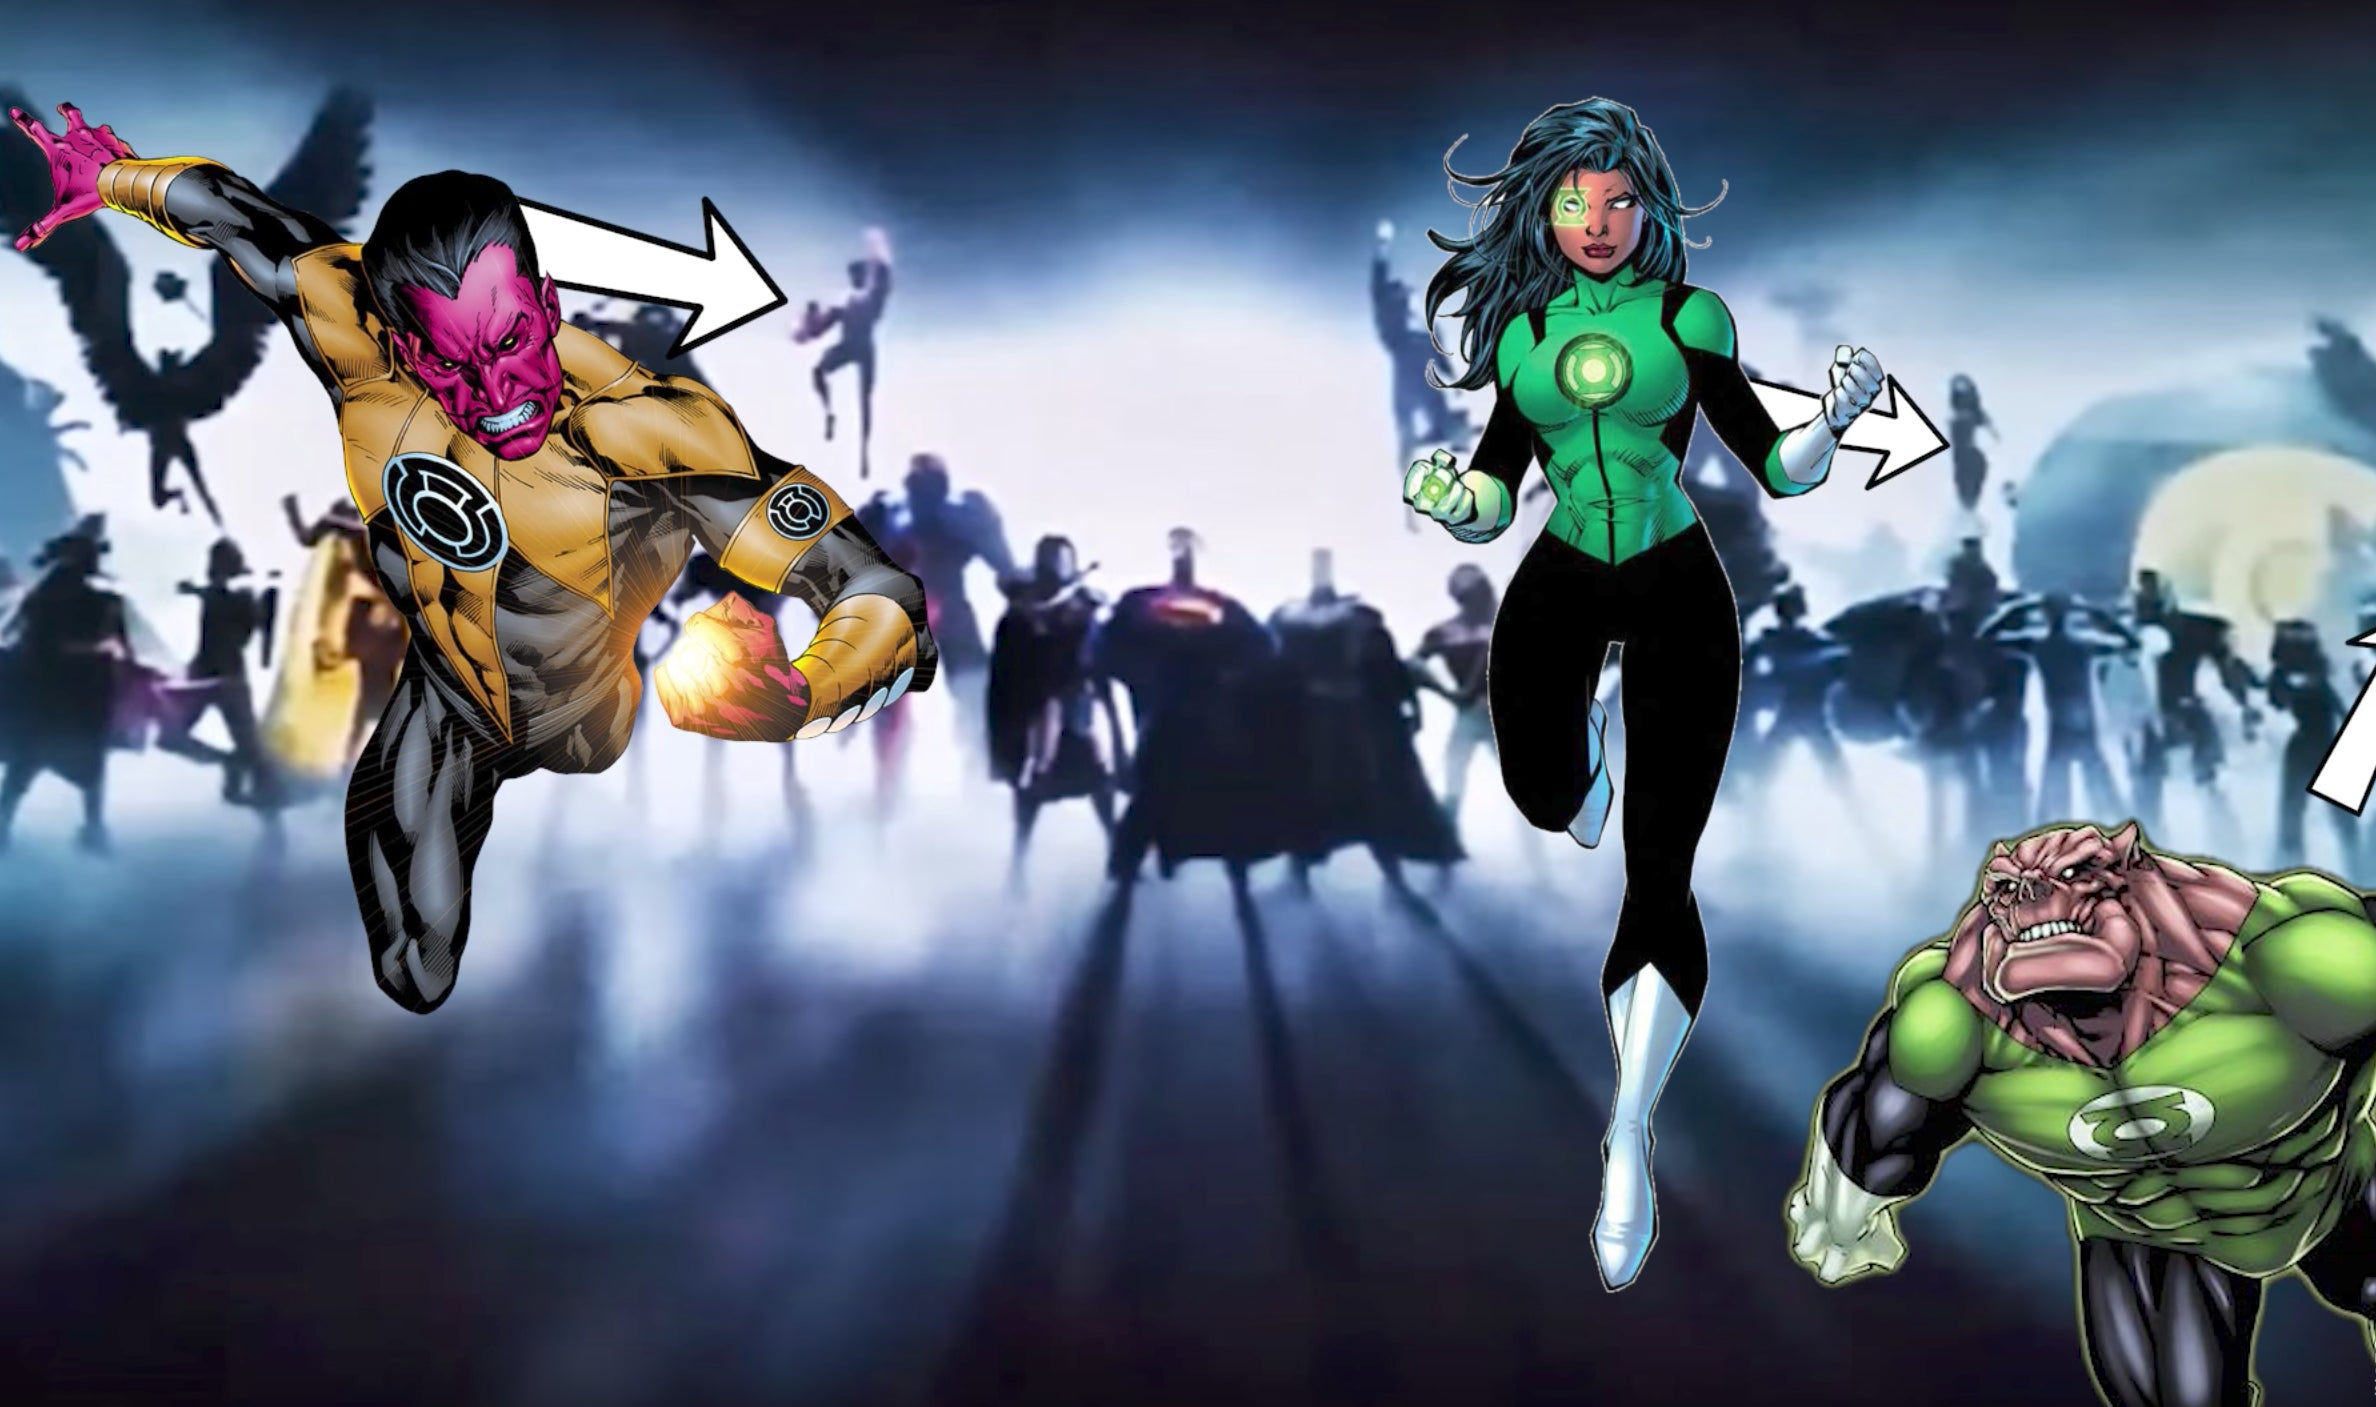 DC Movie Intro - Green Lantern Corps Sinestro Mogo Kilowog